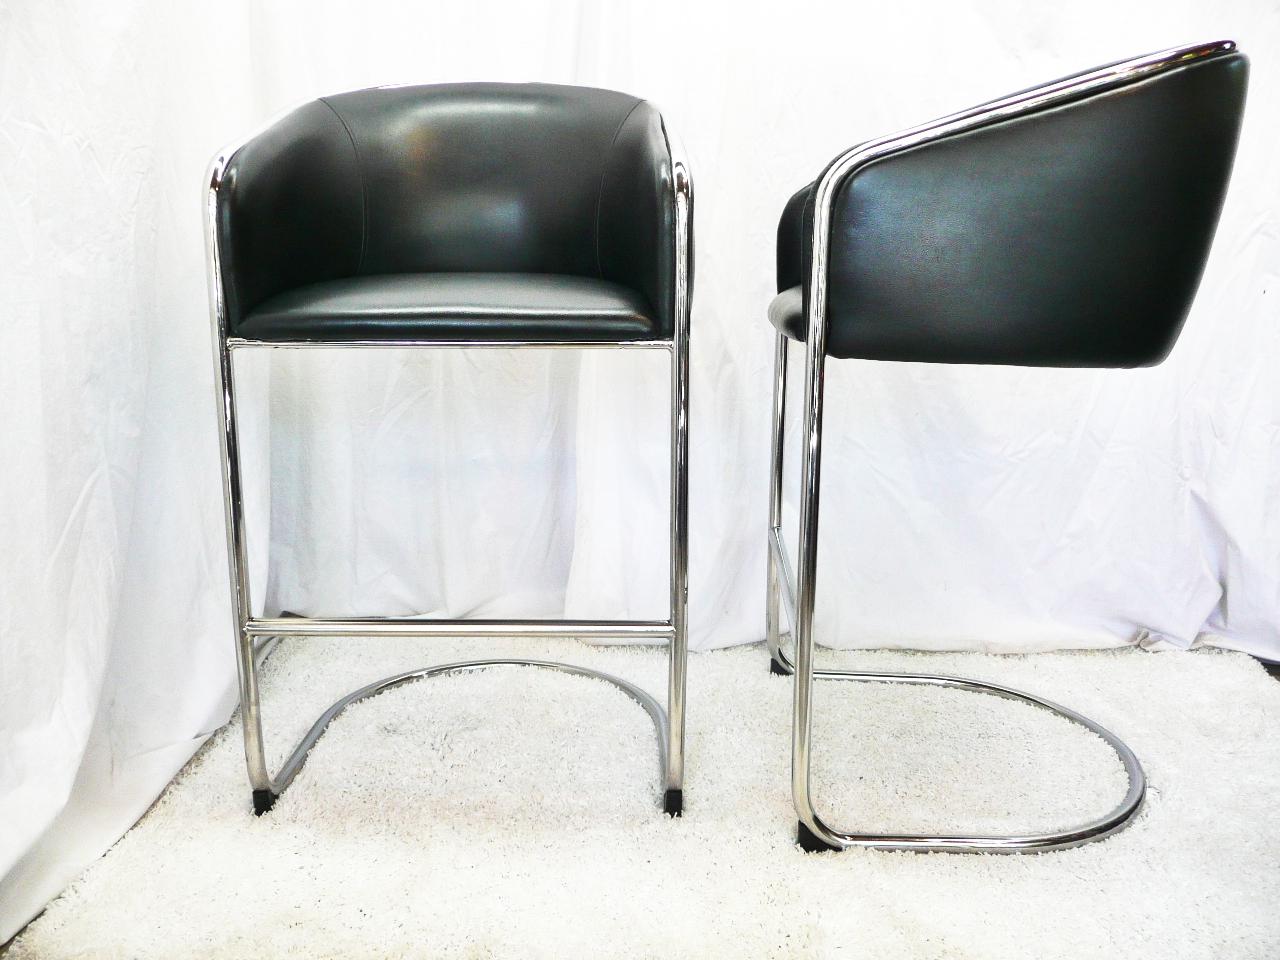 Mid Century Barrel Dining Chair La Z Boy Cool Modern, Century, Danish, Vintage Furniture Shop, Used, Restoration, Repair - Denver ...